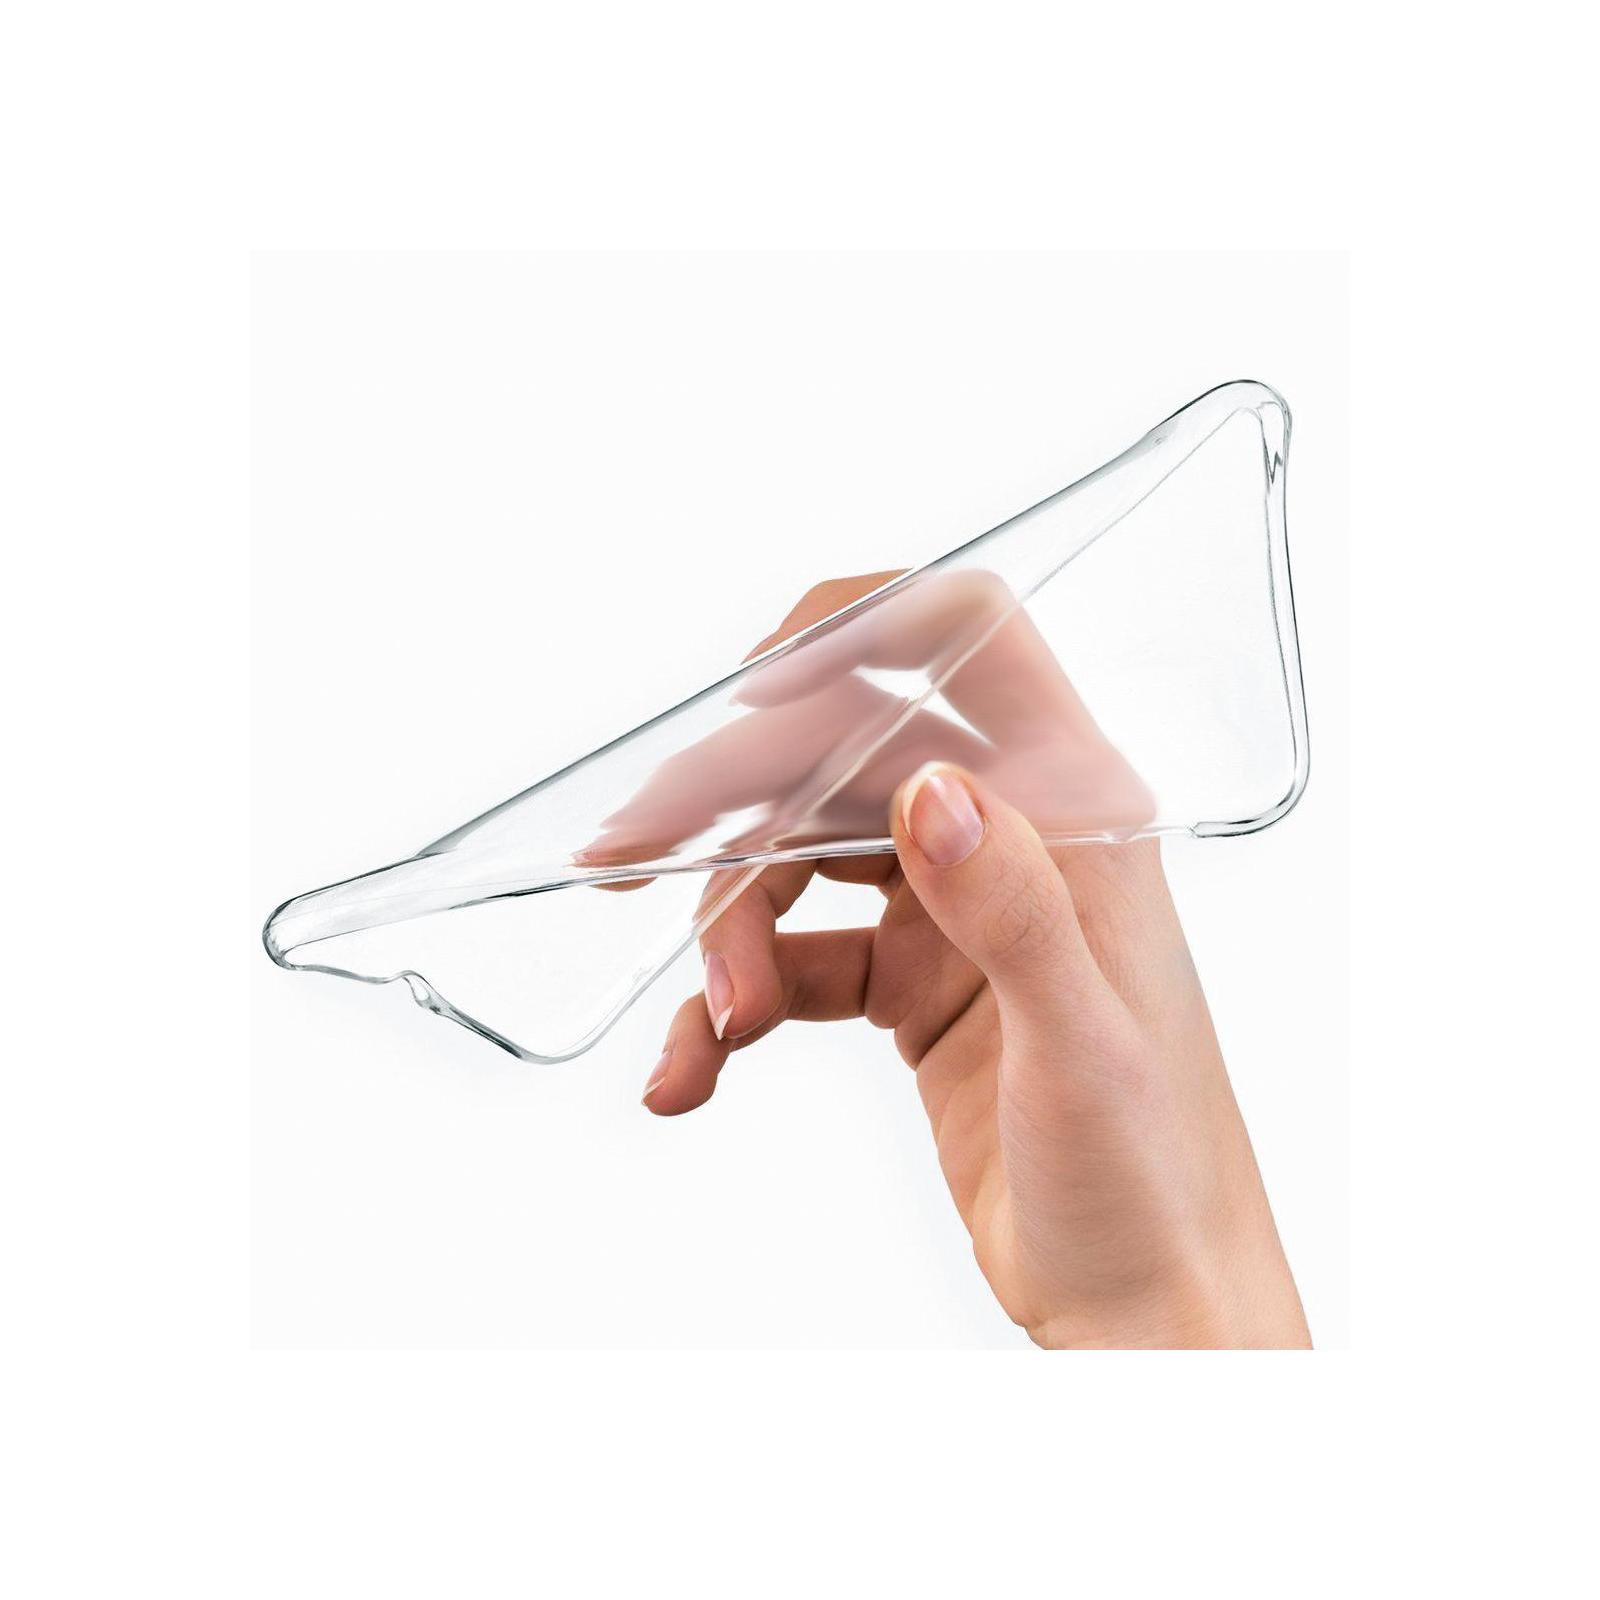 Чехол для моб. телефона SmartCase Samsung Galaxy J5 / J530 TPU Clear (SC-J530) изображение 4